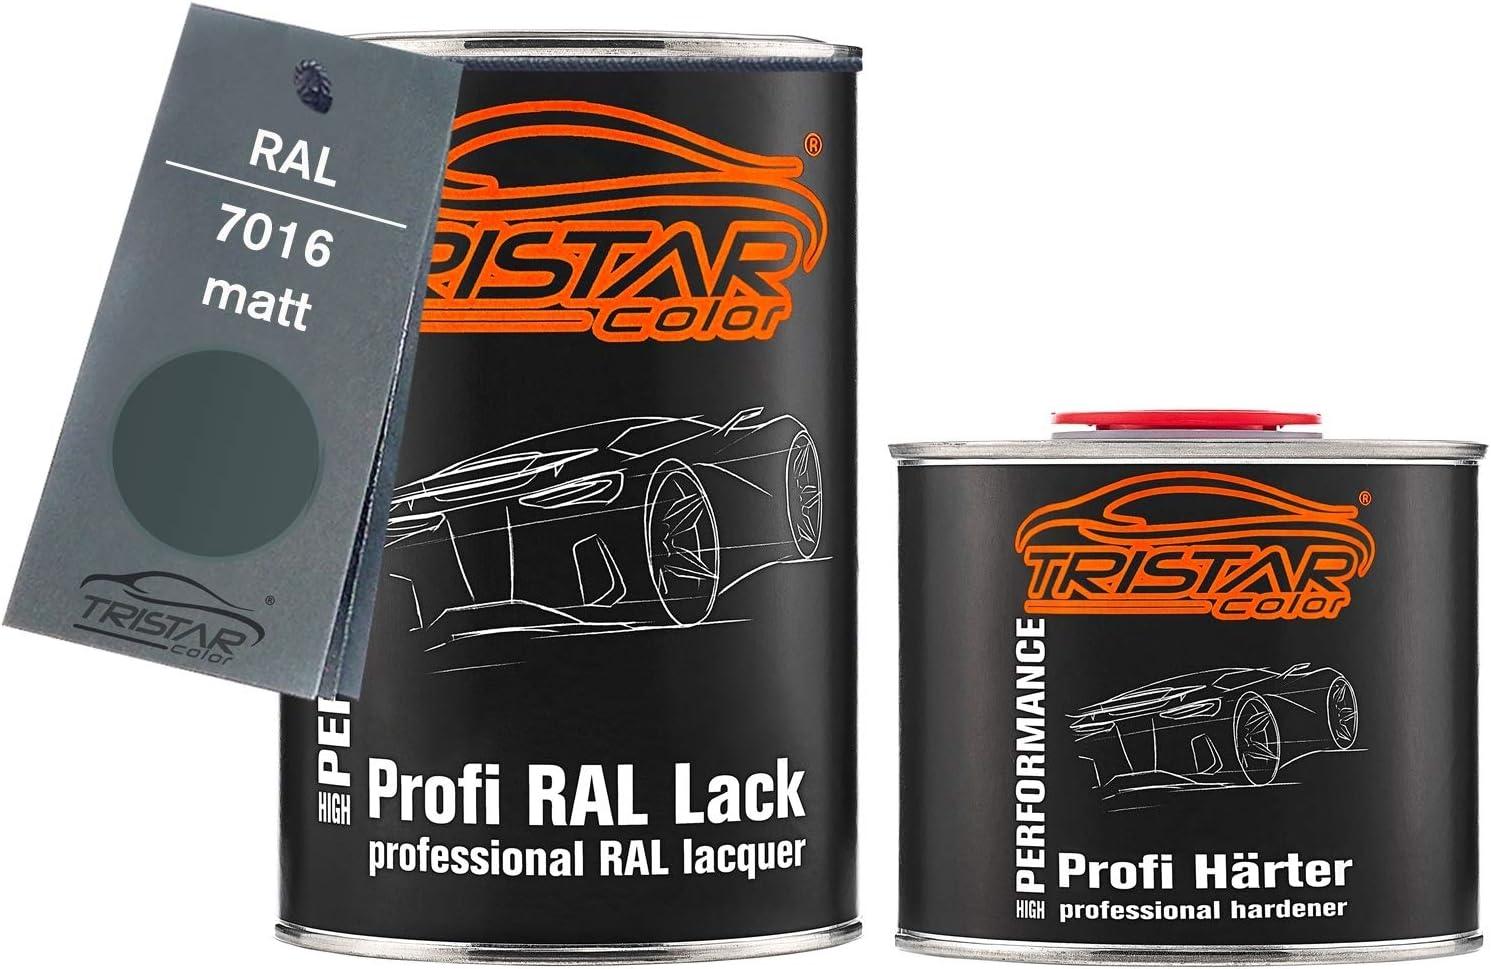 Tristarcolor Ral 7016 Anthrazitgrau Matt 2k Autolack 1 5 Liter 1500 Ml Dose Inkl Härter Auto